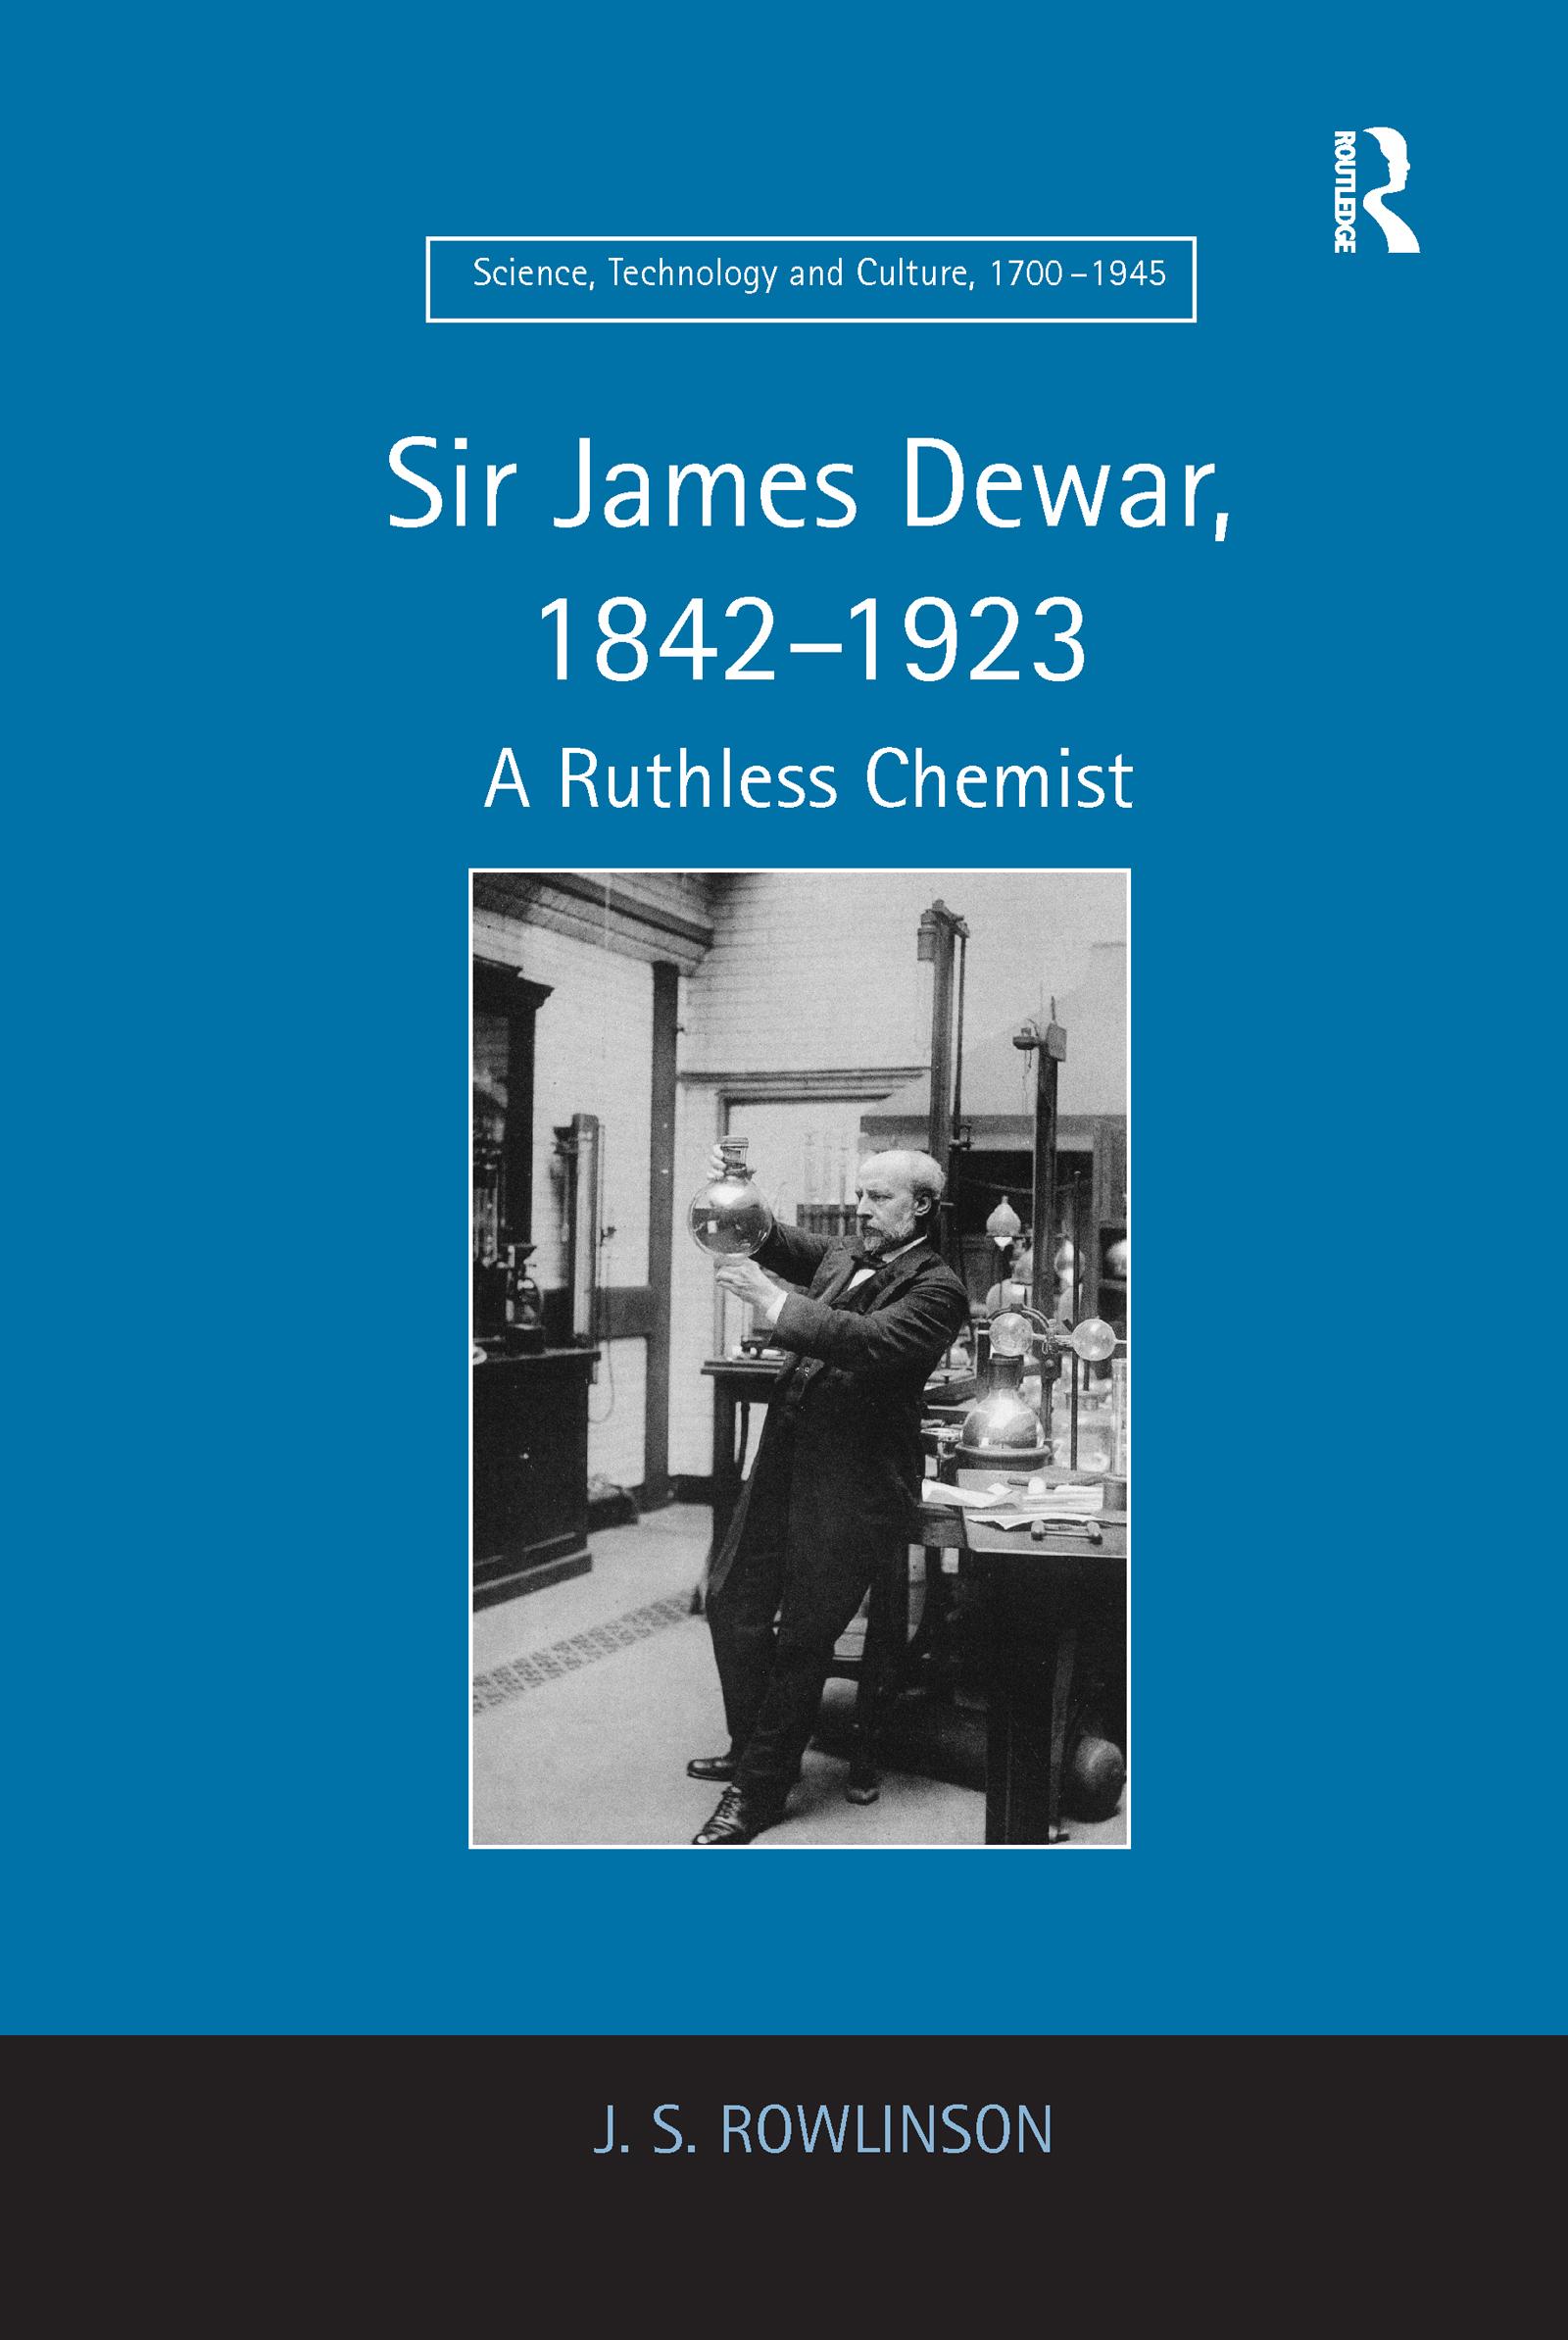 Sir James Dewar, 1842-1923